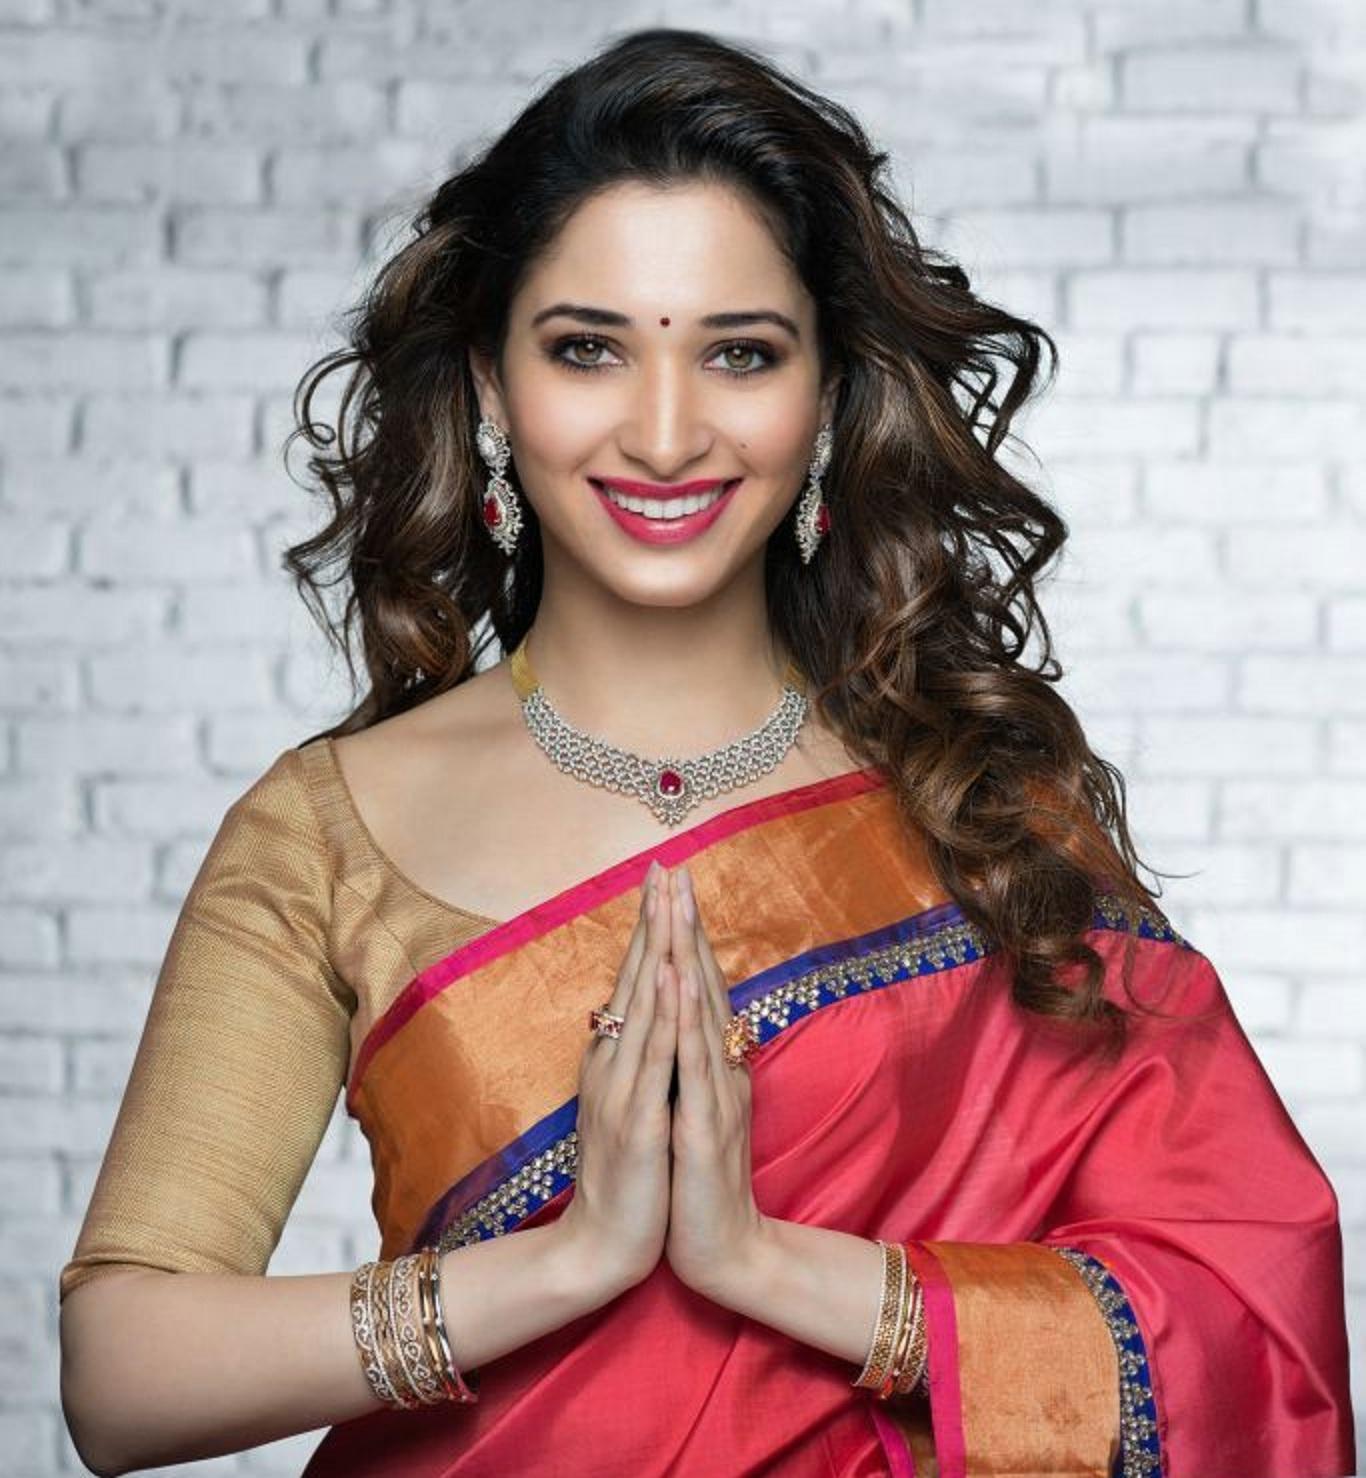 most beautiful tamannaah bhatia wallpaper - free all hd wallpapers